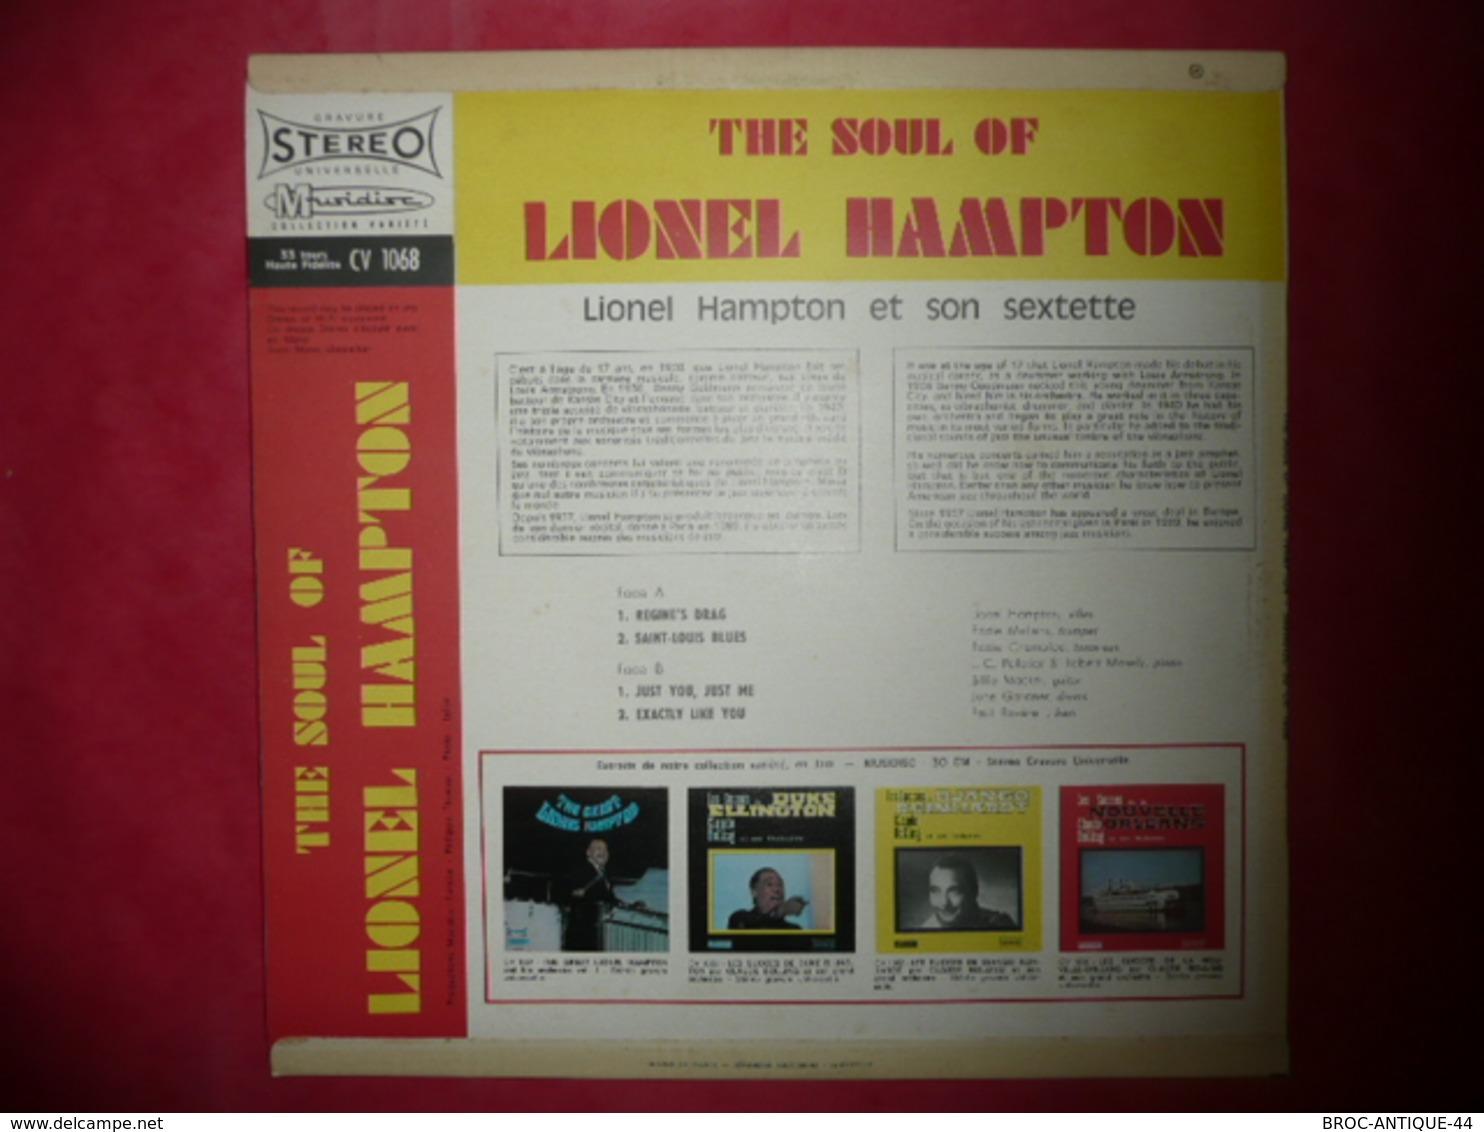 LP N°3262 - LIONEL HAMPTON - 30 CV 1068 - Jazz